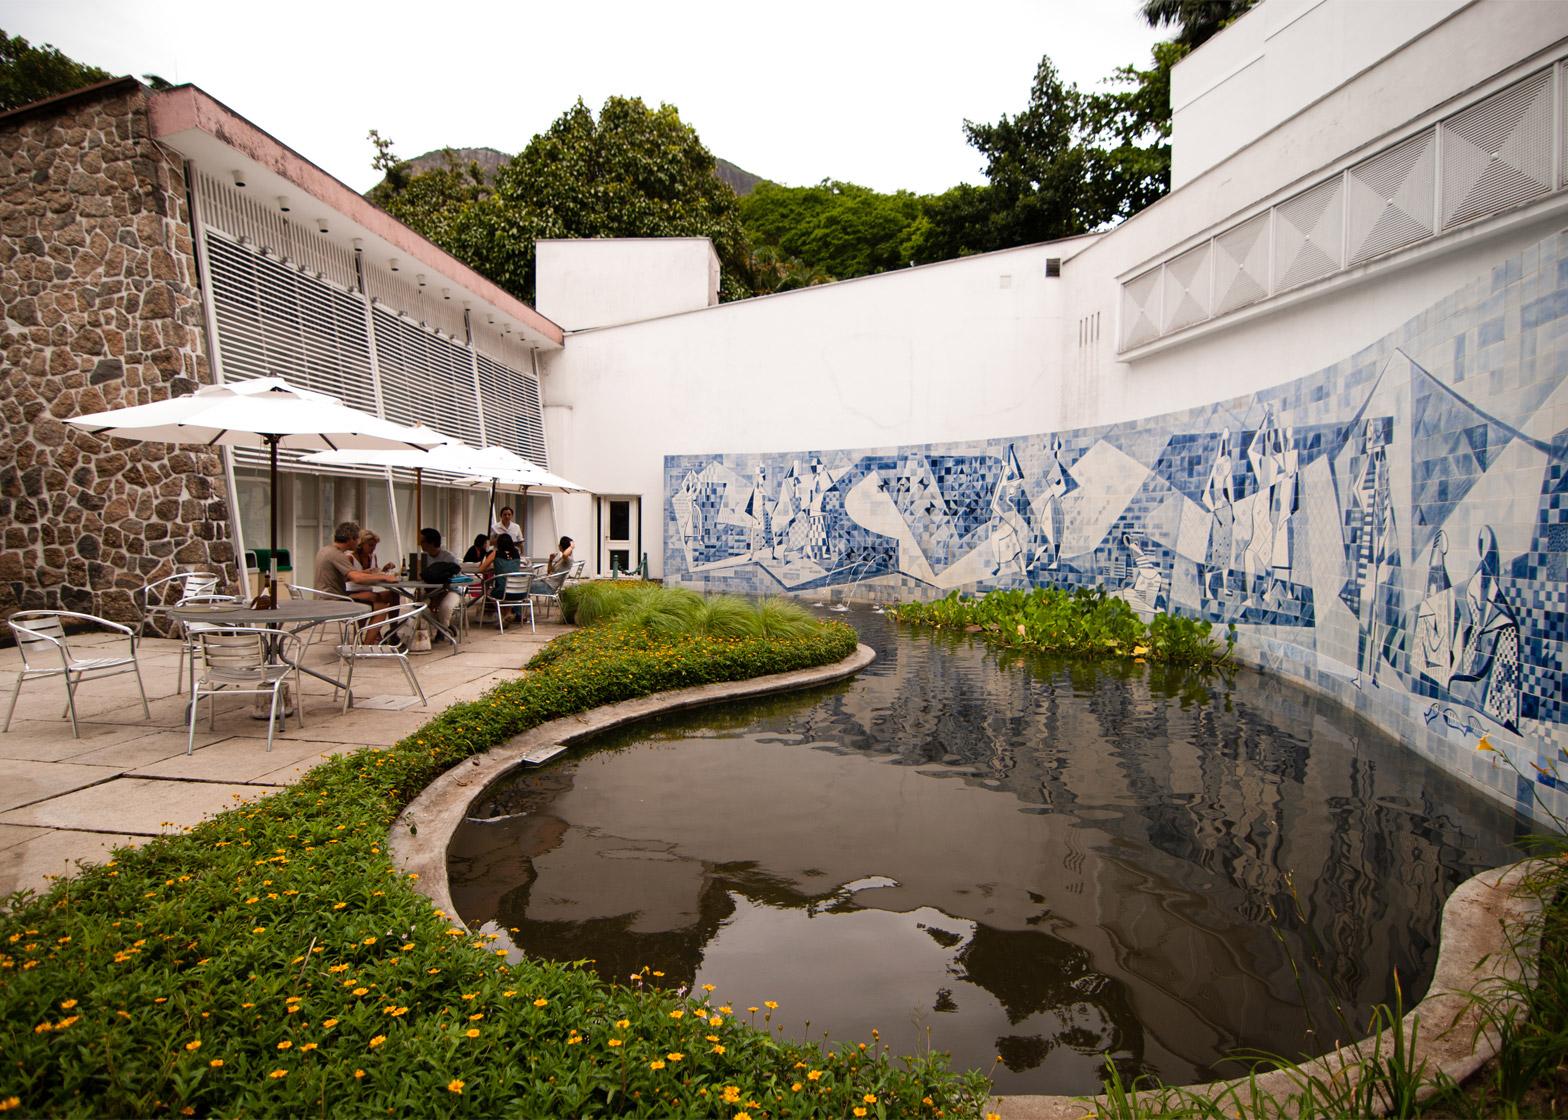 Instituto Moreira Salles by Olavo Redig de Campos, 1951